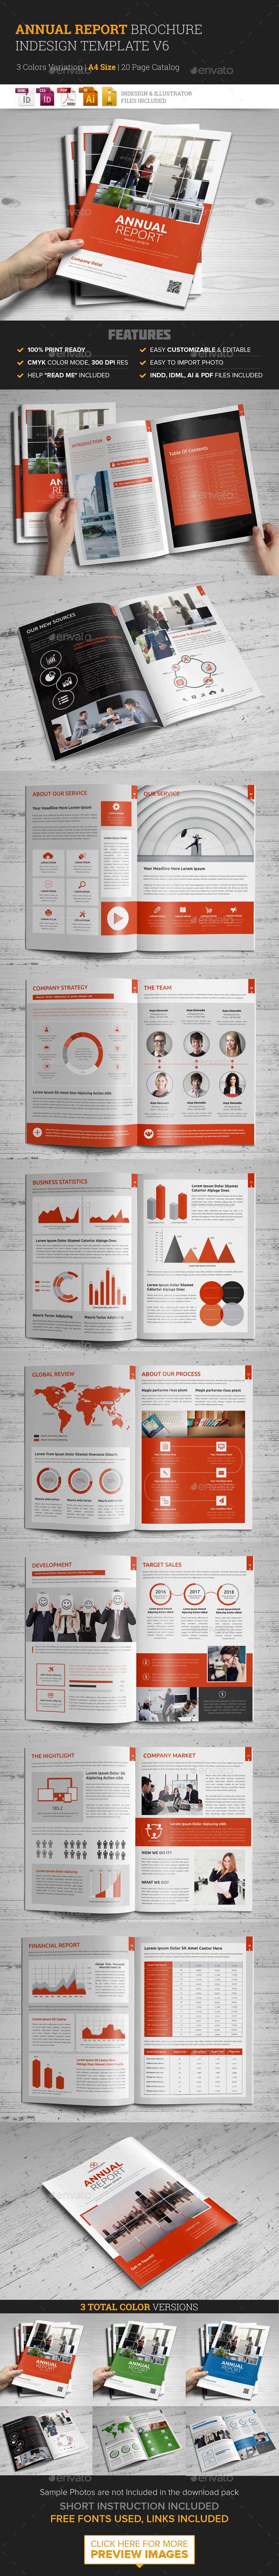 Annual Report Brochure design 6 - Corporate Brochures